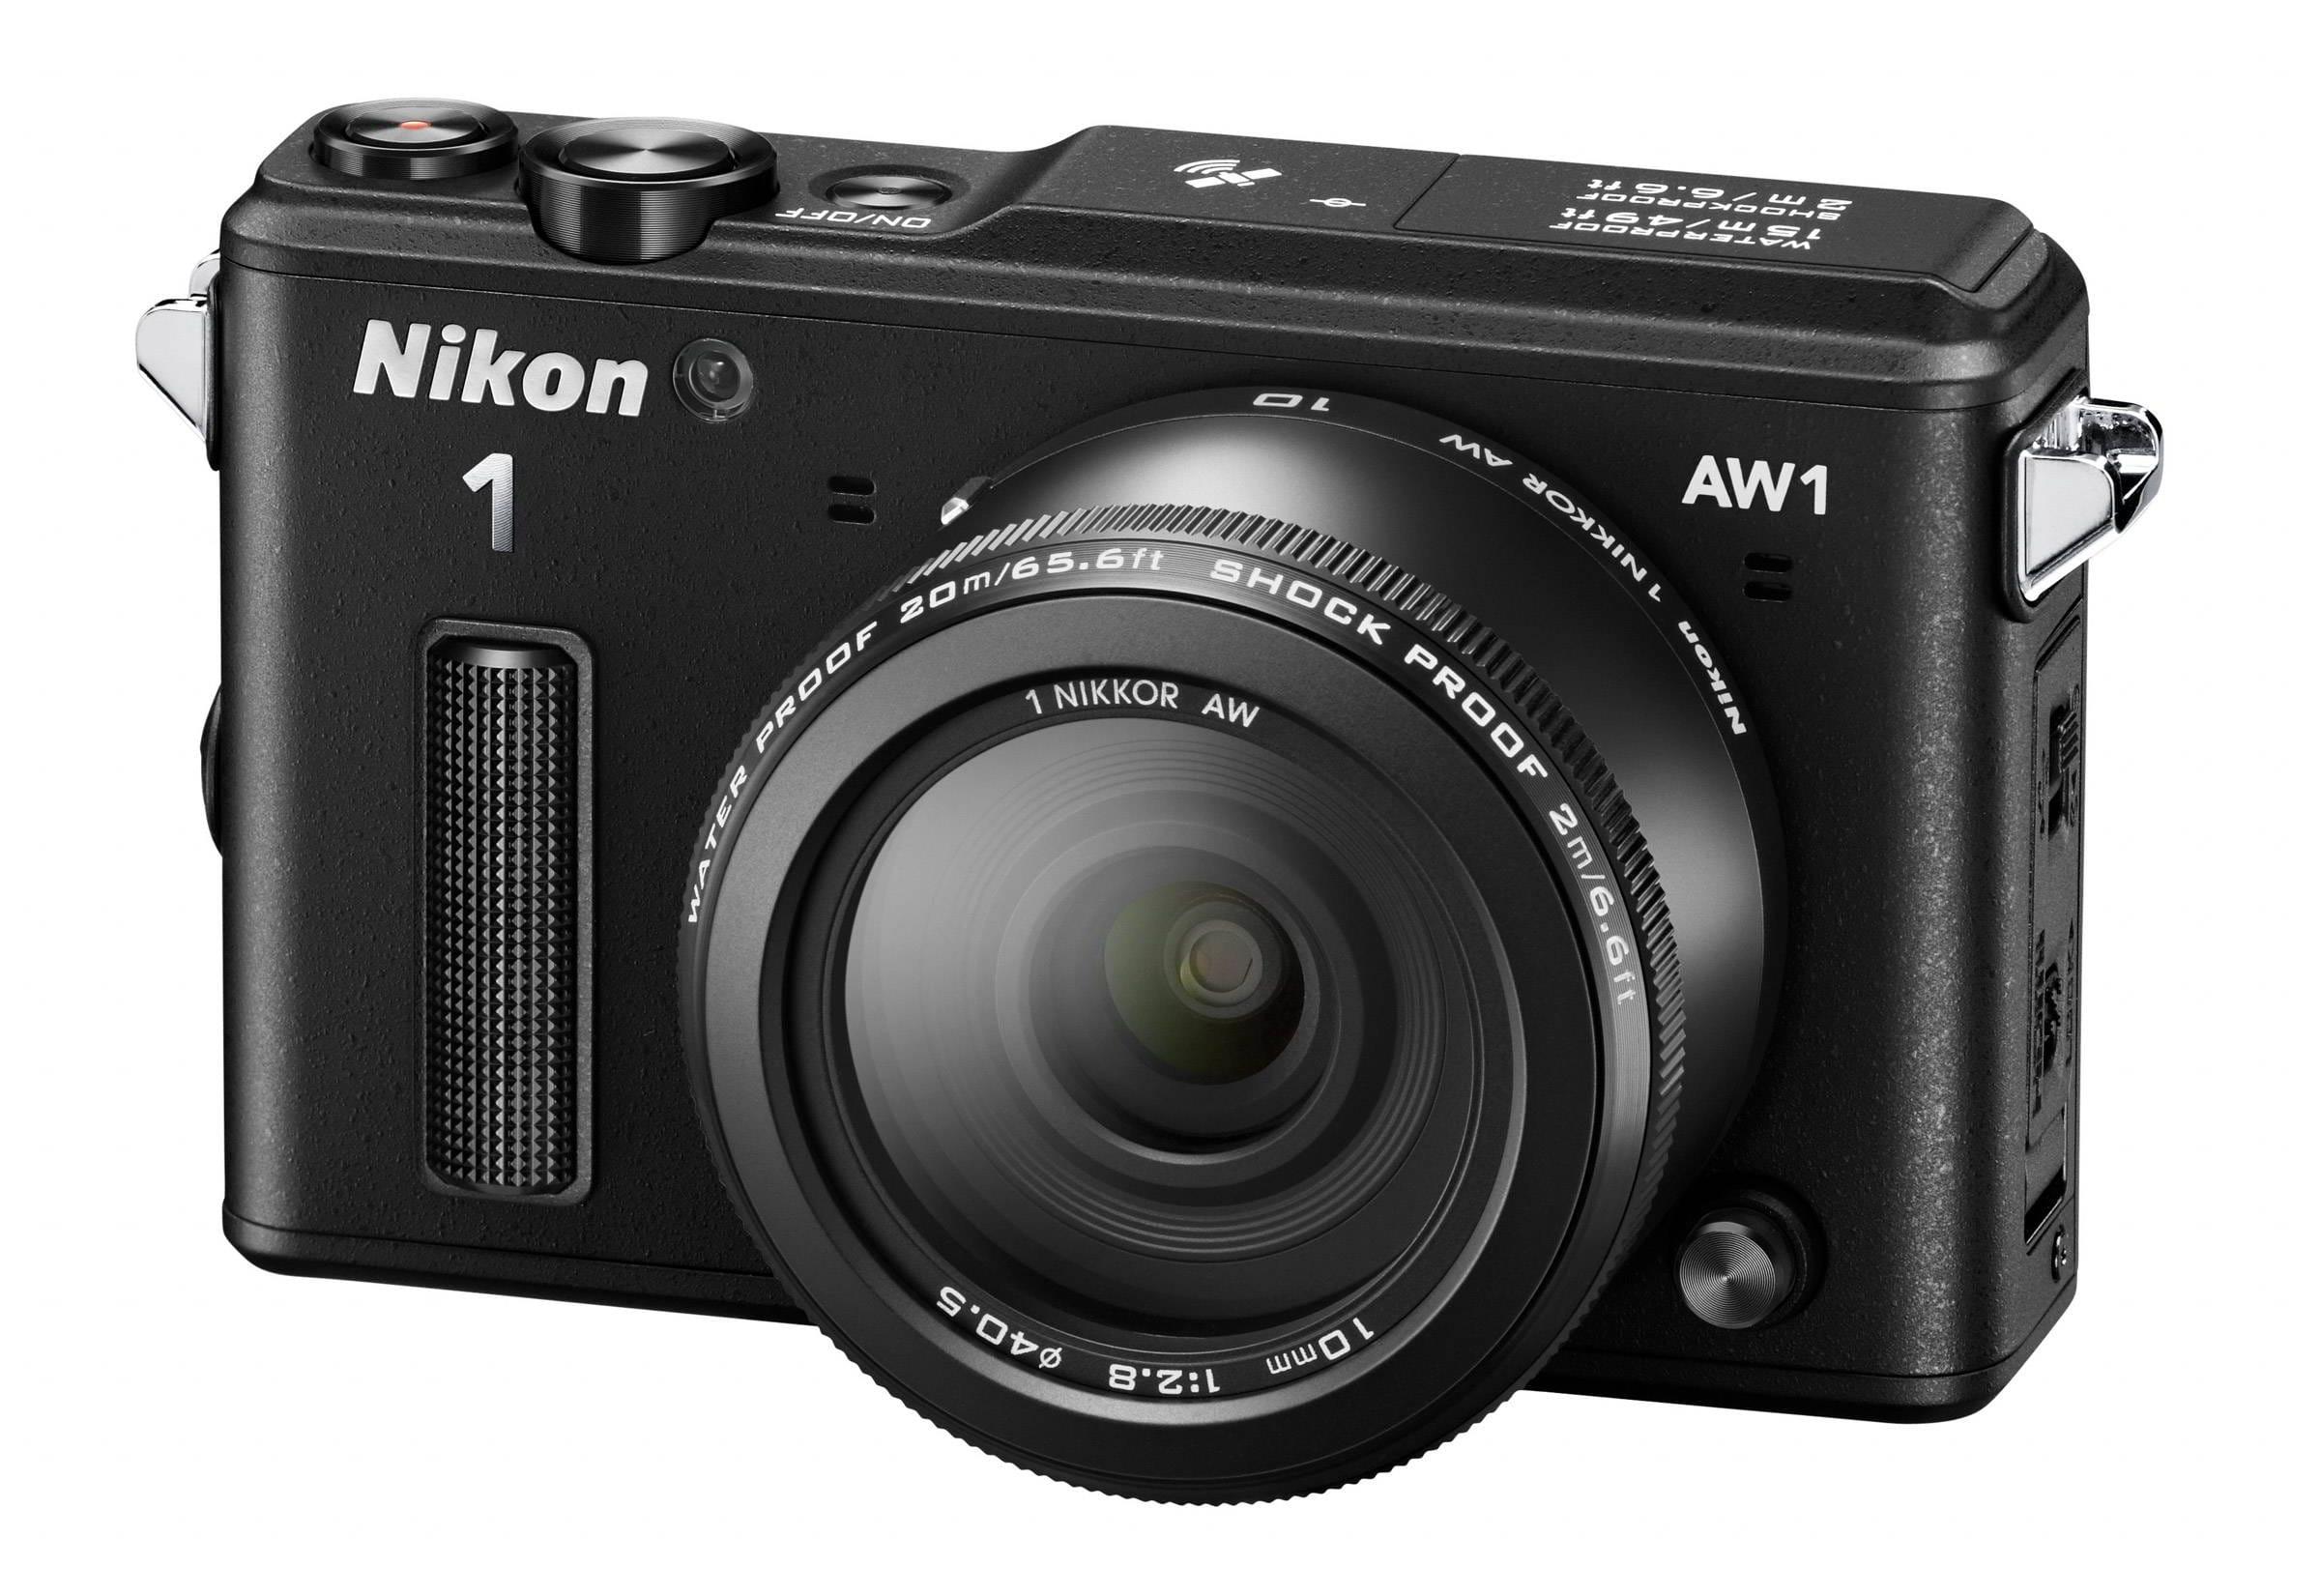 NIKON 1 AW1 black + 1 Nikkor 10 mm + 1 Nikkor 11-27,5 mm + LEXAR SD 400x 8GB